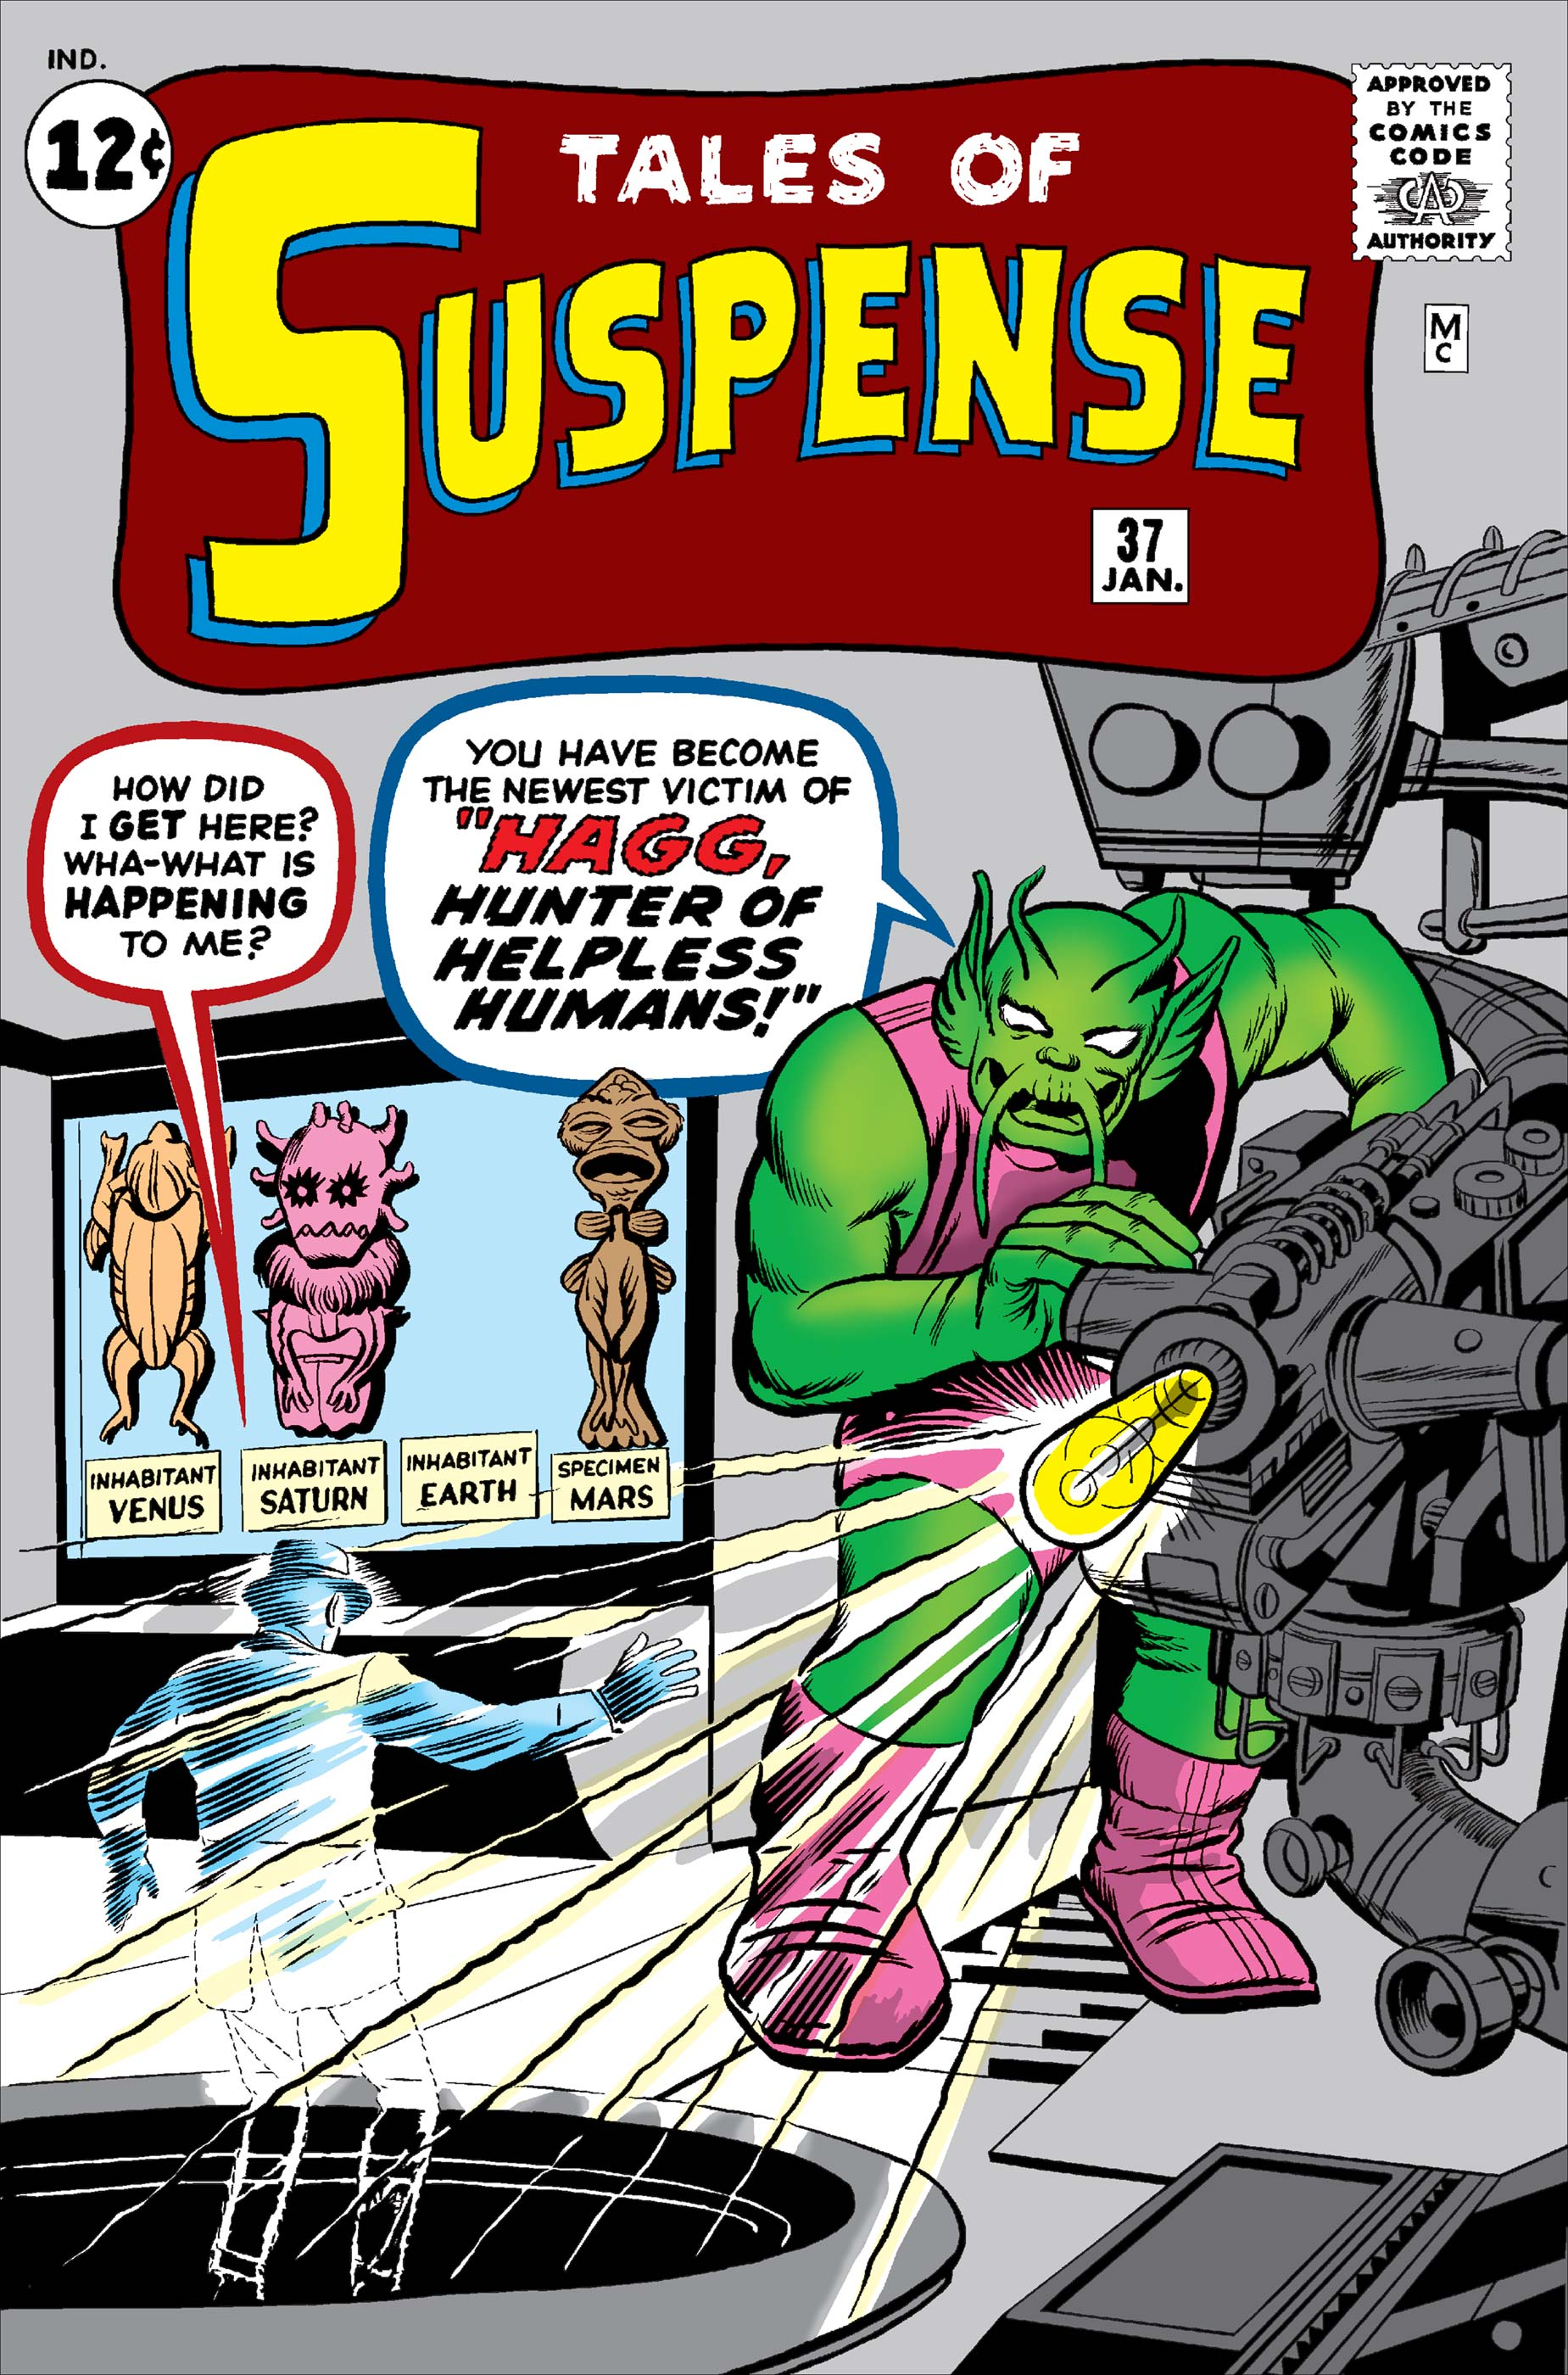 Tales of Suspense (1959) #37